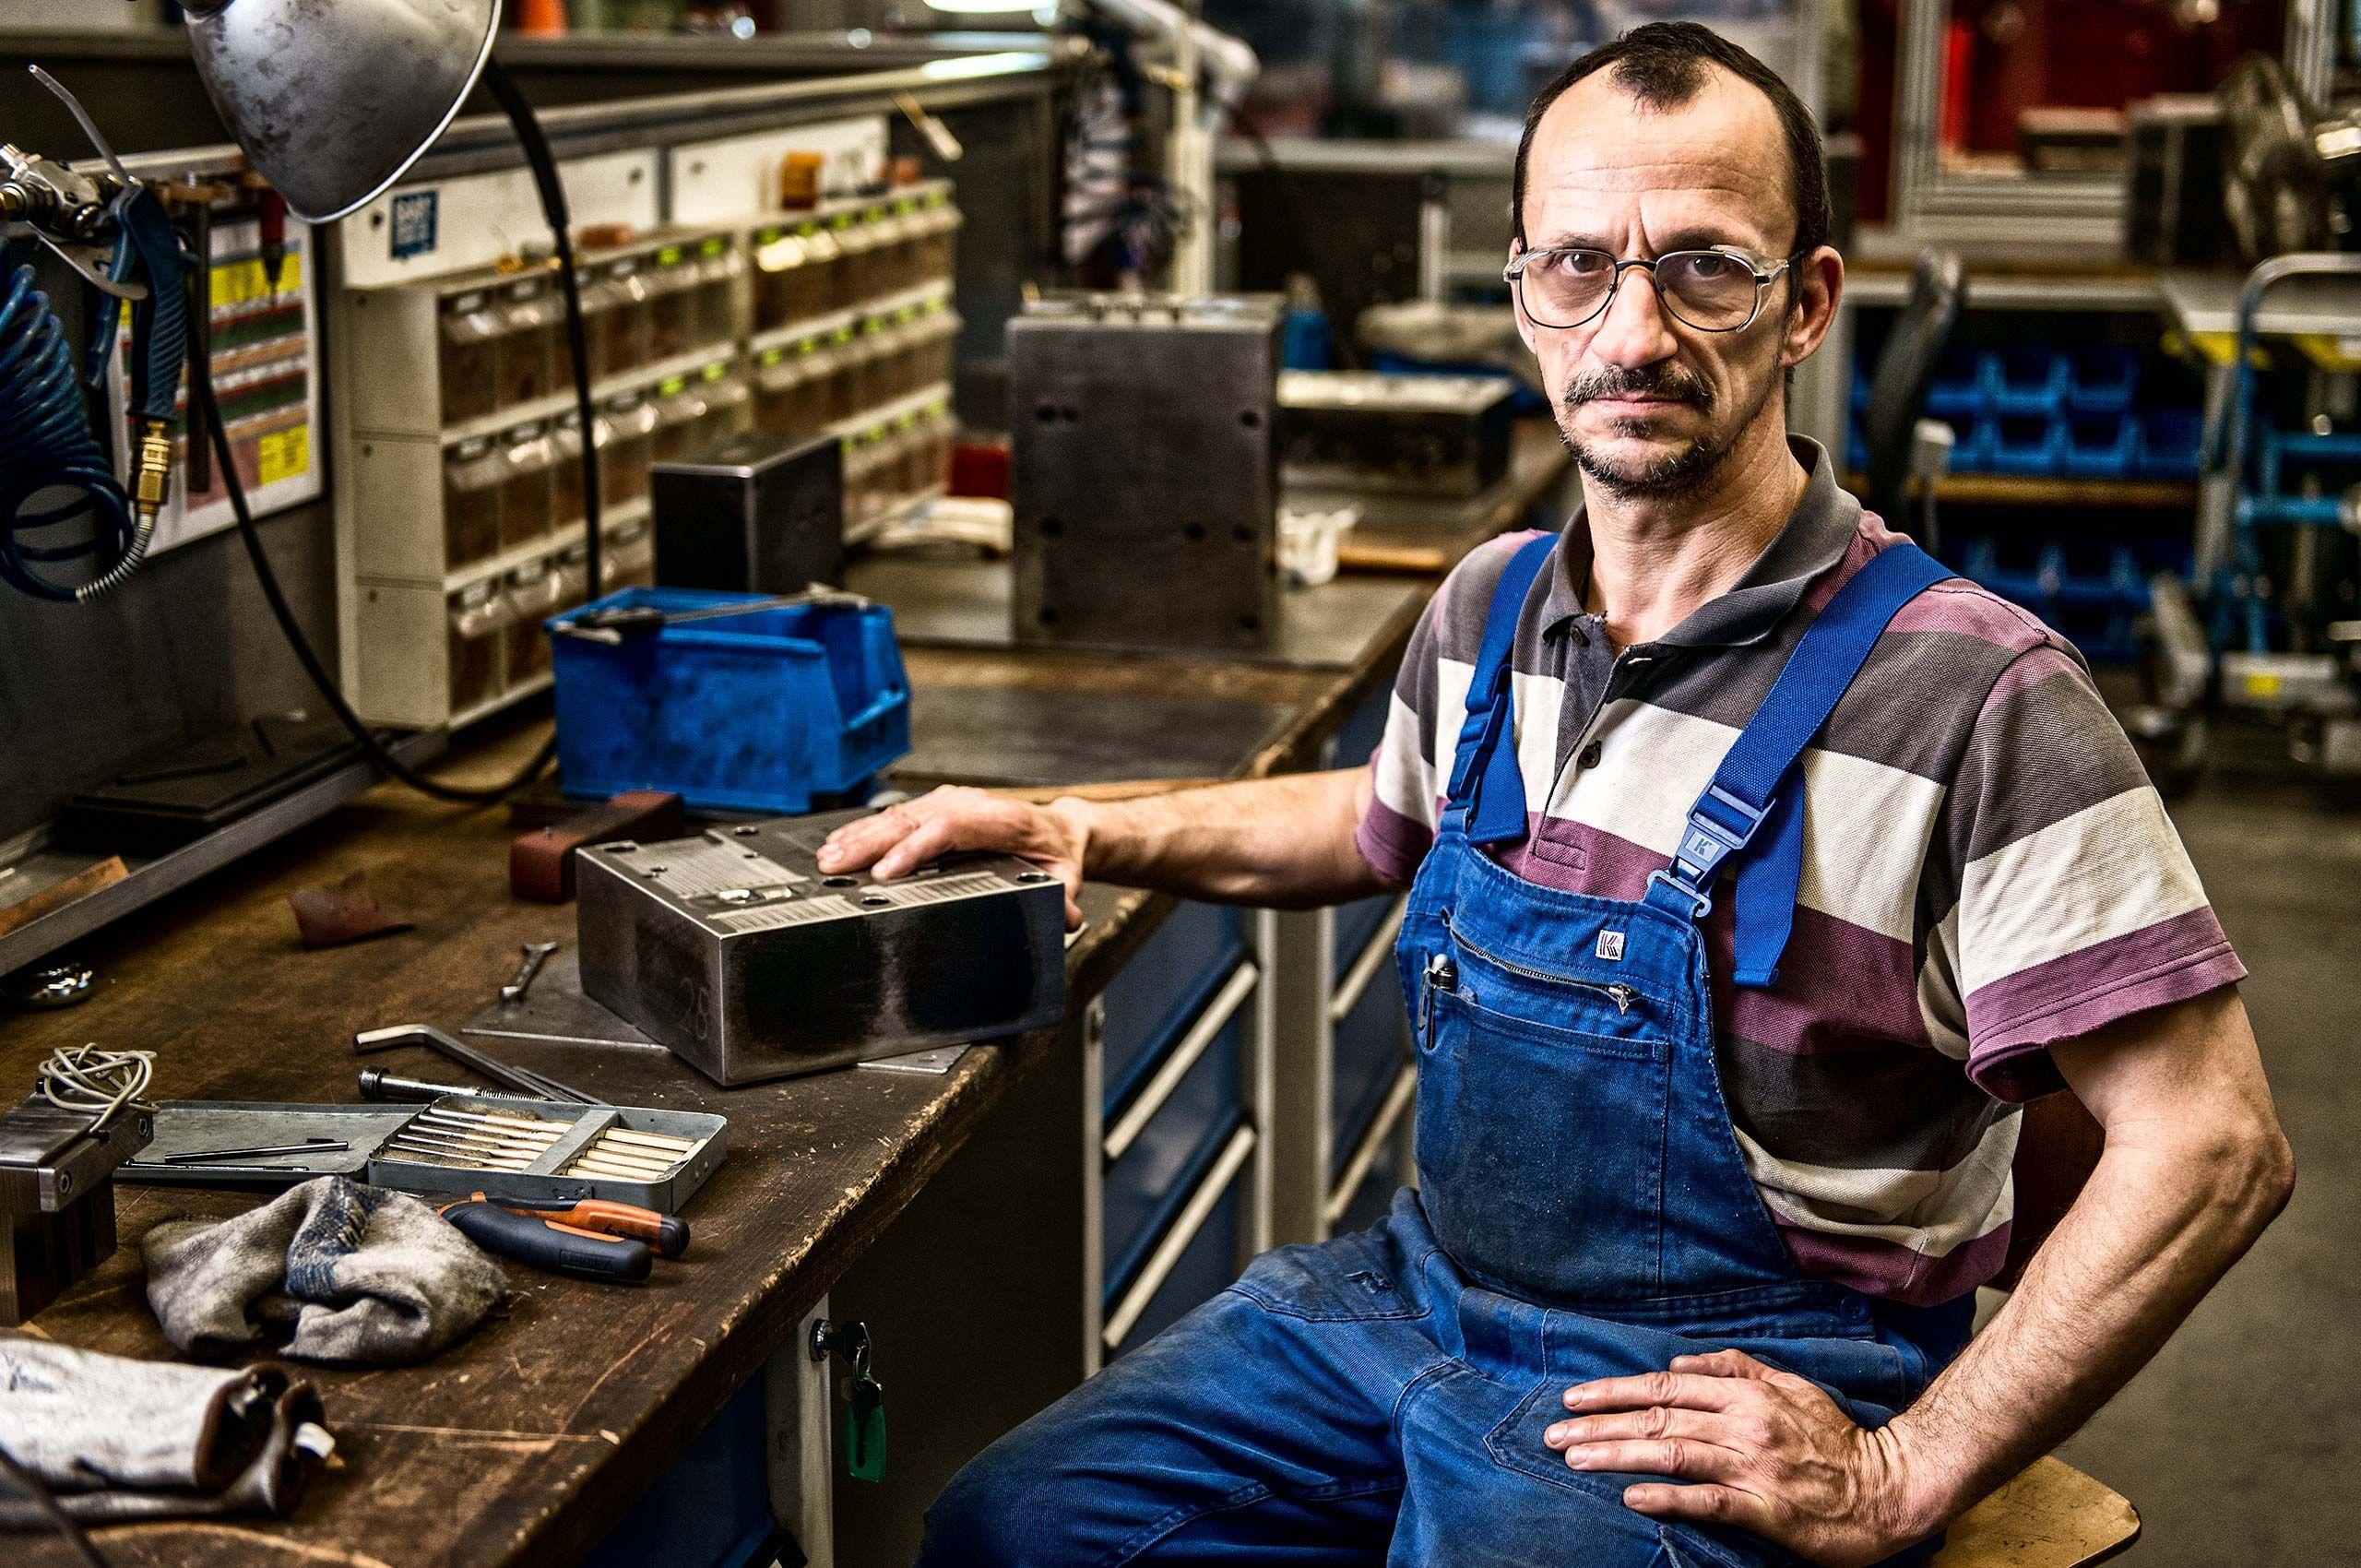 precision-tools-wusthof-factory-HenrikOlundPhotography.jpg